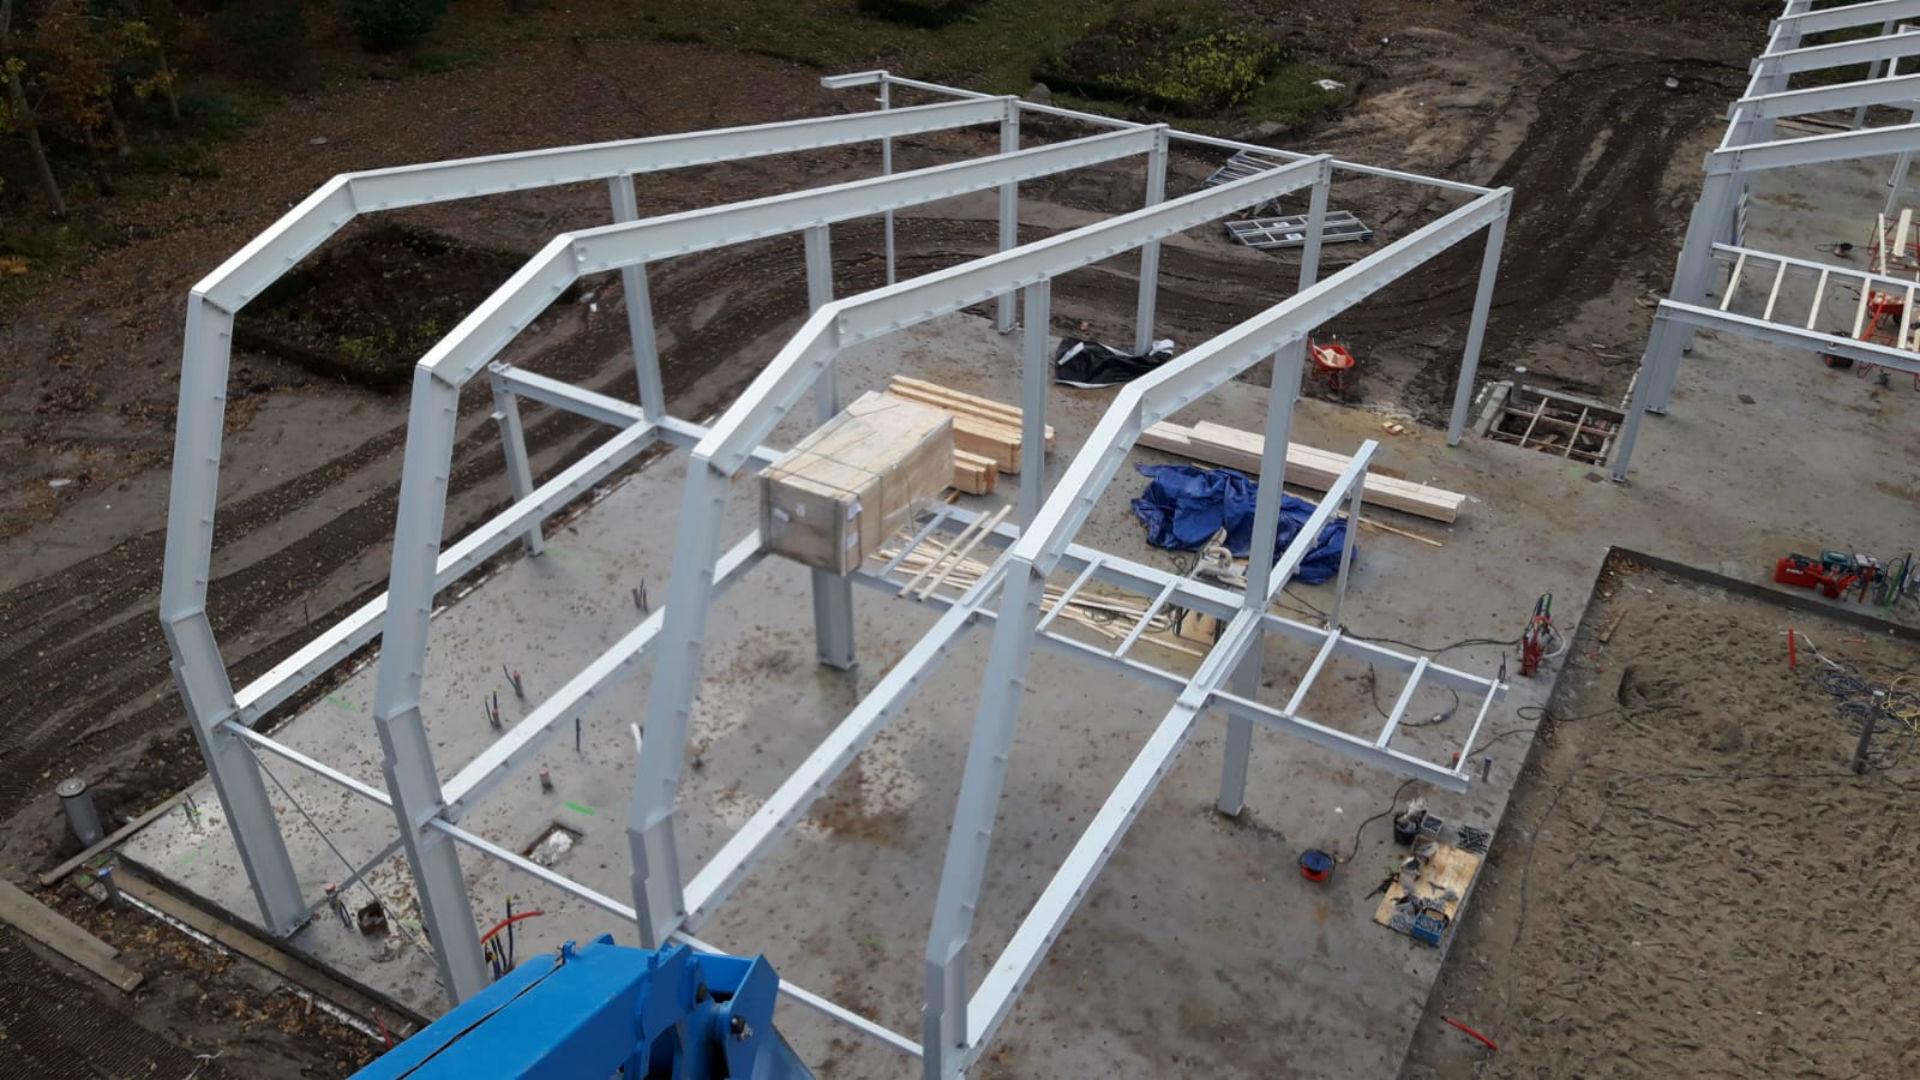 Constructie Villa in Aerdenhout